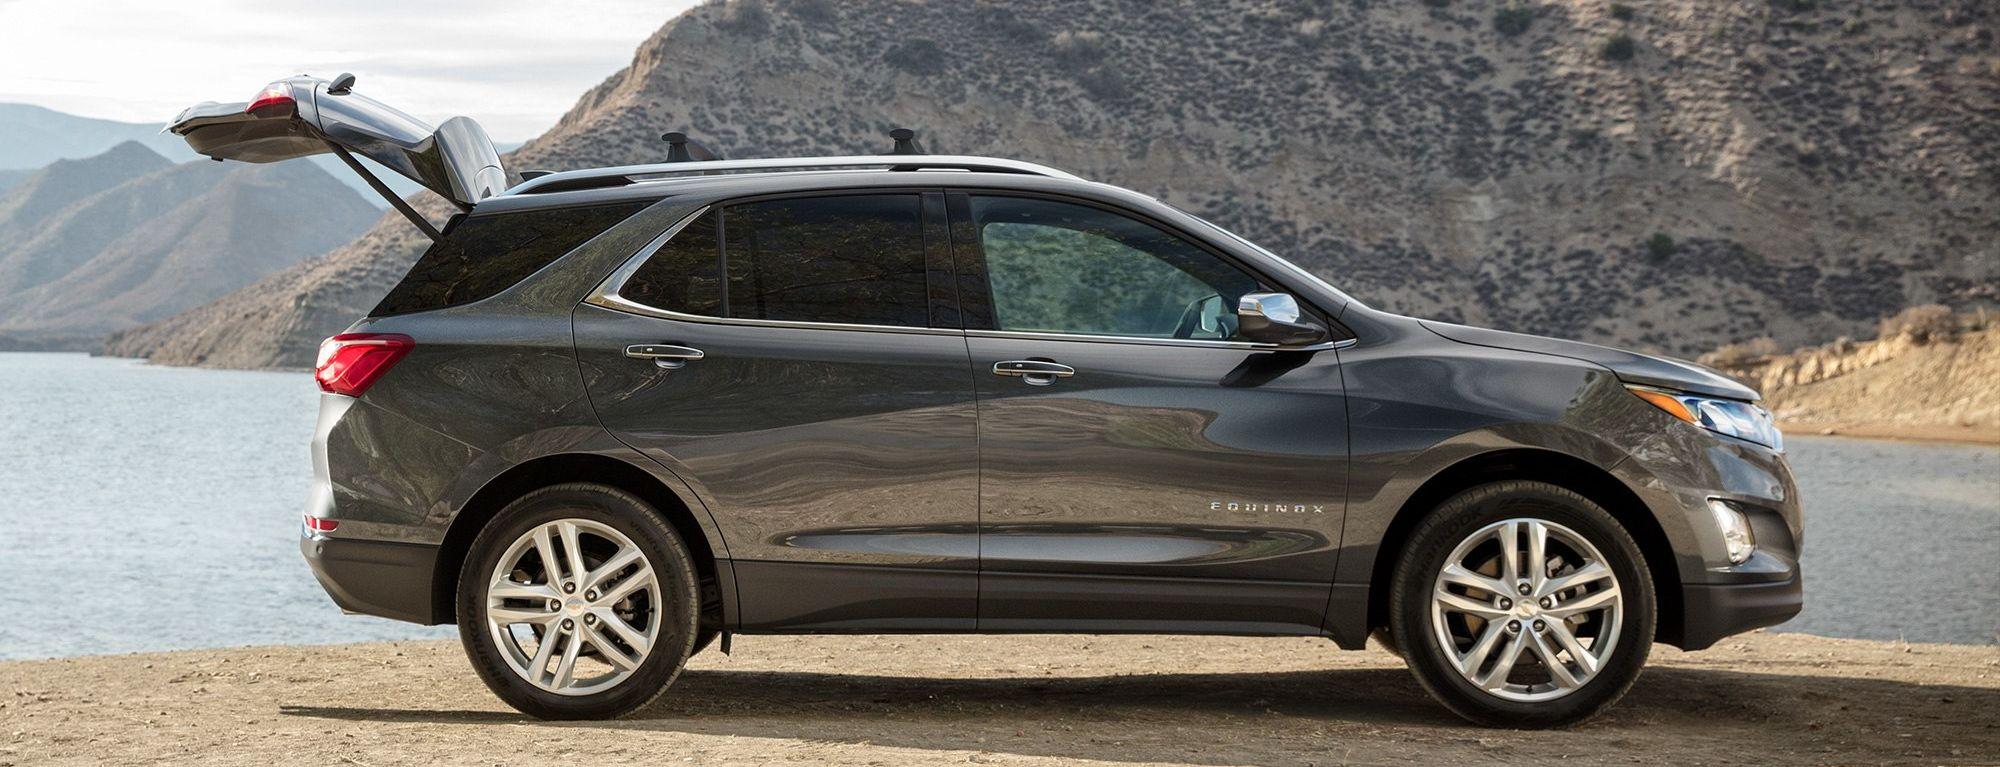 2019 Chevrolet Equinox Financing near Worthington, MN